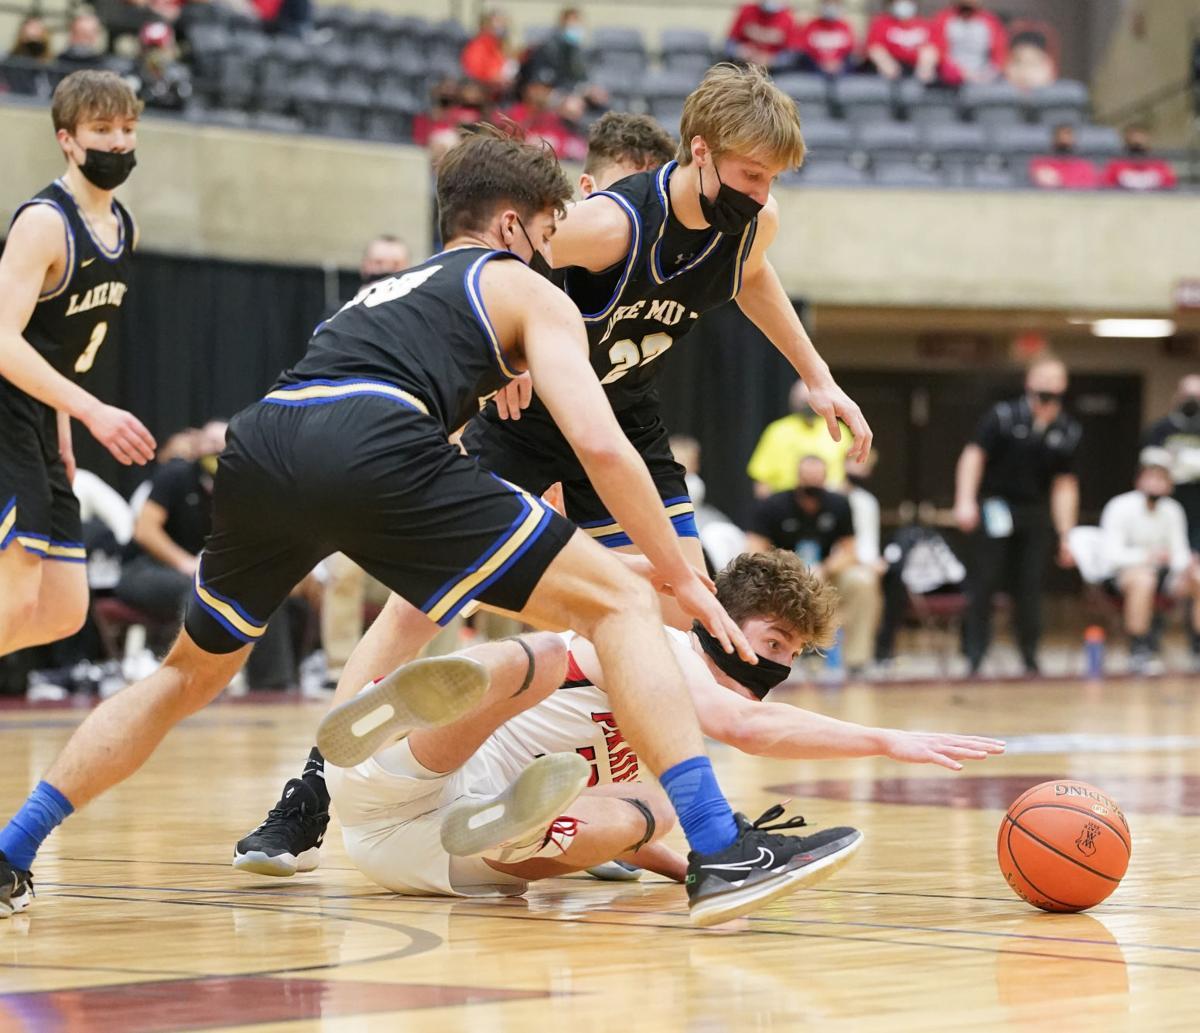 WIAA boys basketball photo: Lake Mills' Jaxson Retrum and Charlie Bender chase a loose ball